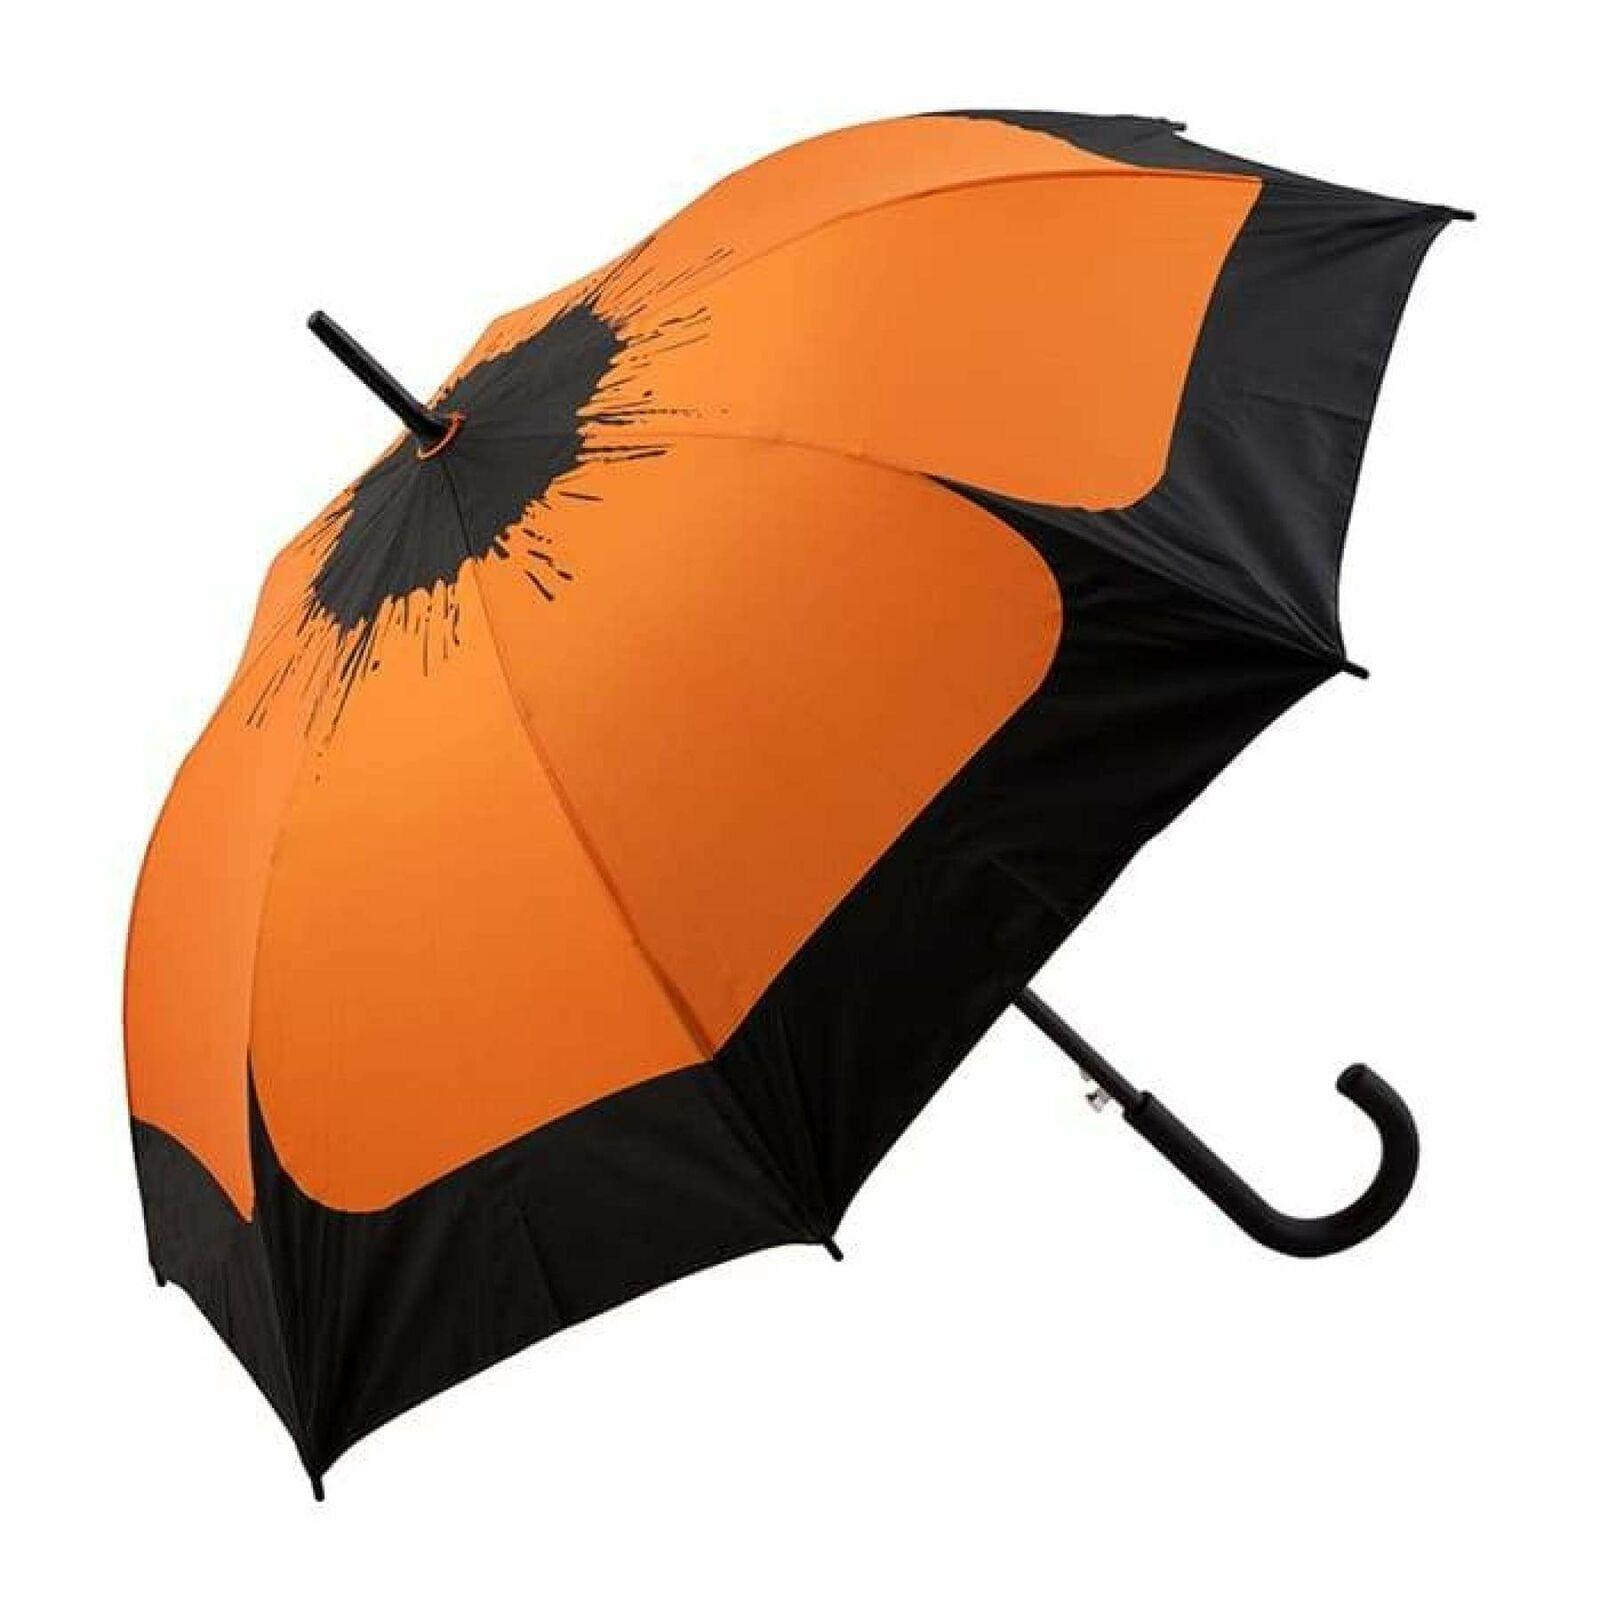 Clifton Auto Fibreglass Hand Printed Walking Flower Orange Rain Umbrella